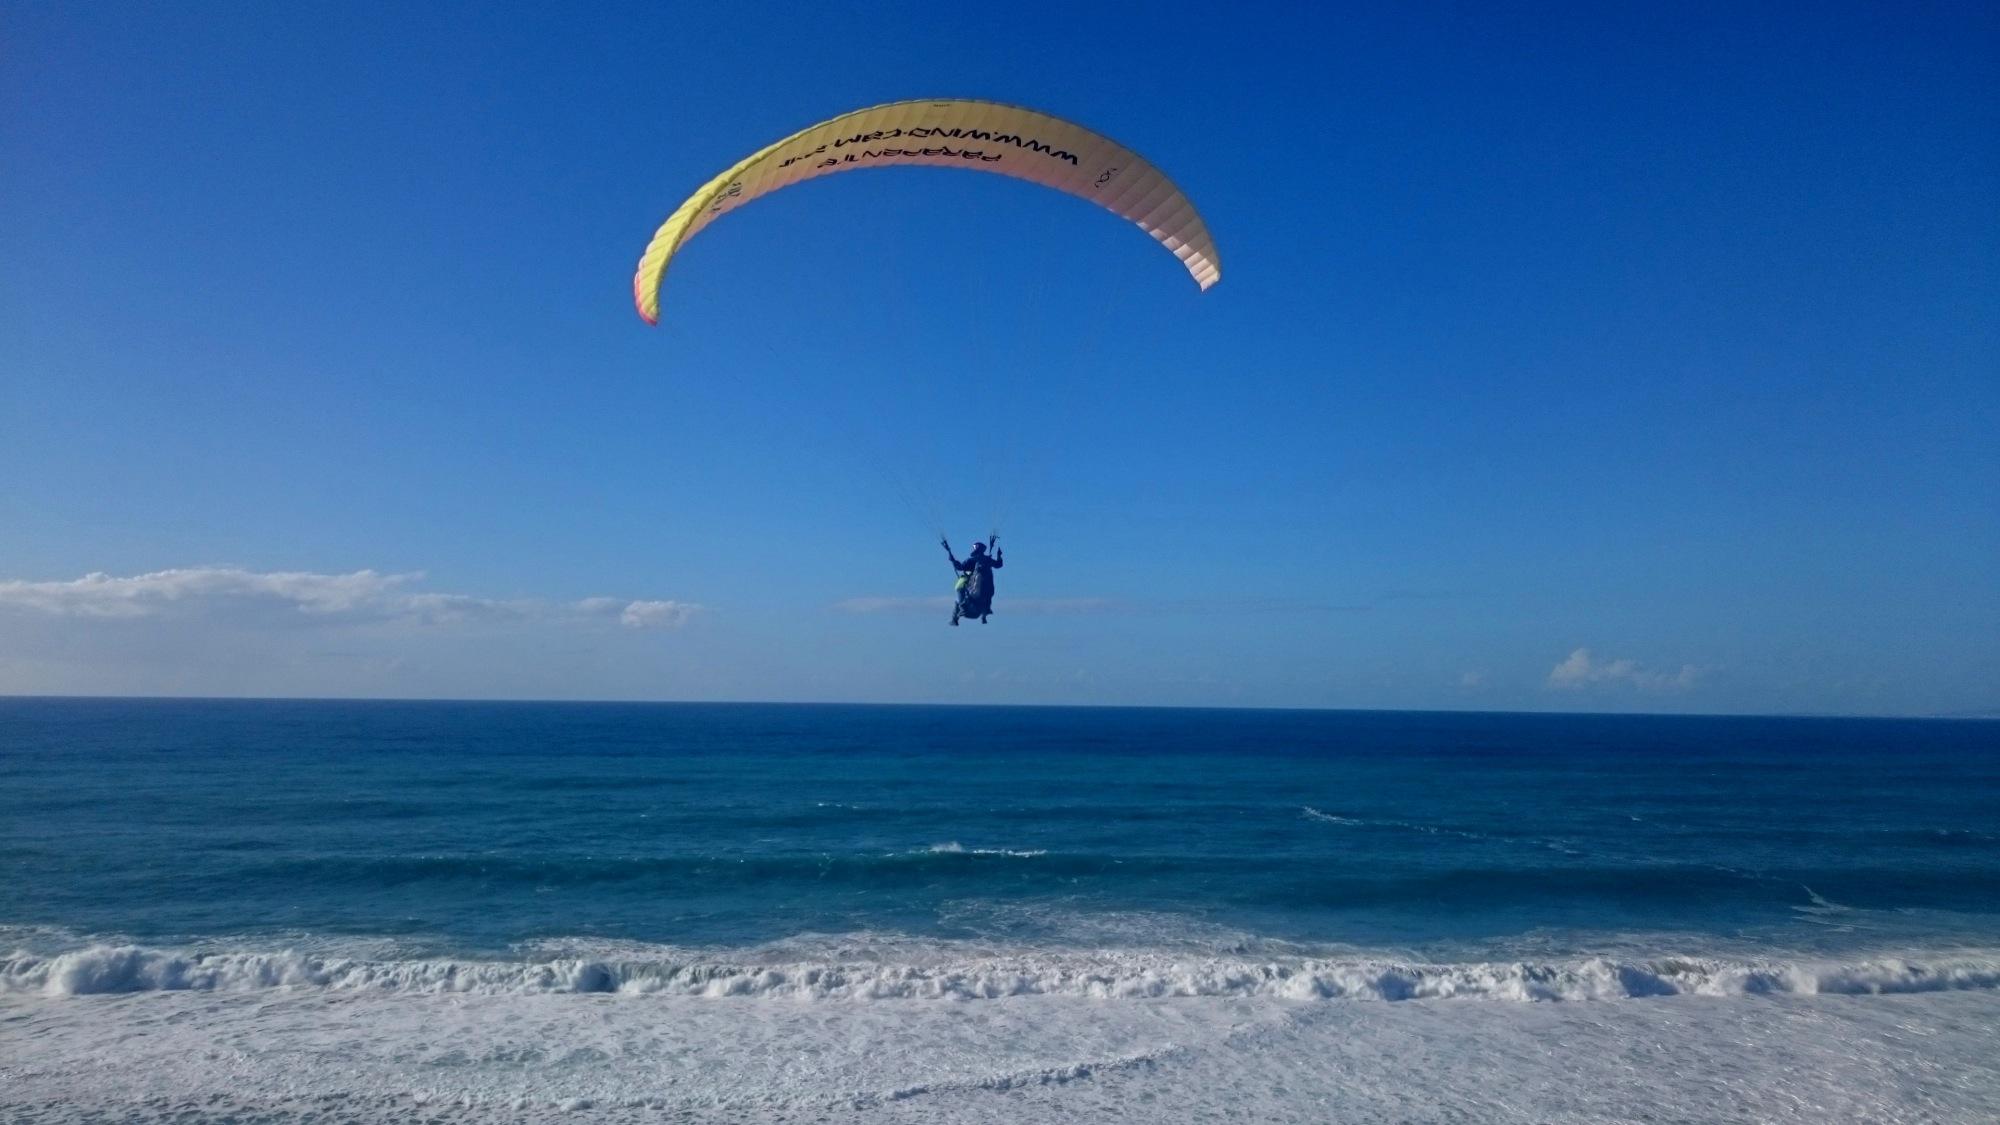 Paragliding event